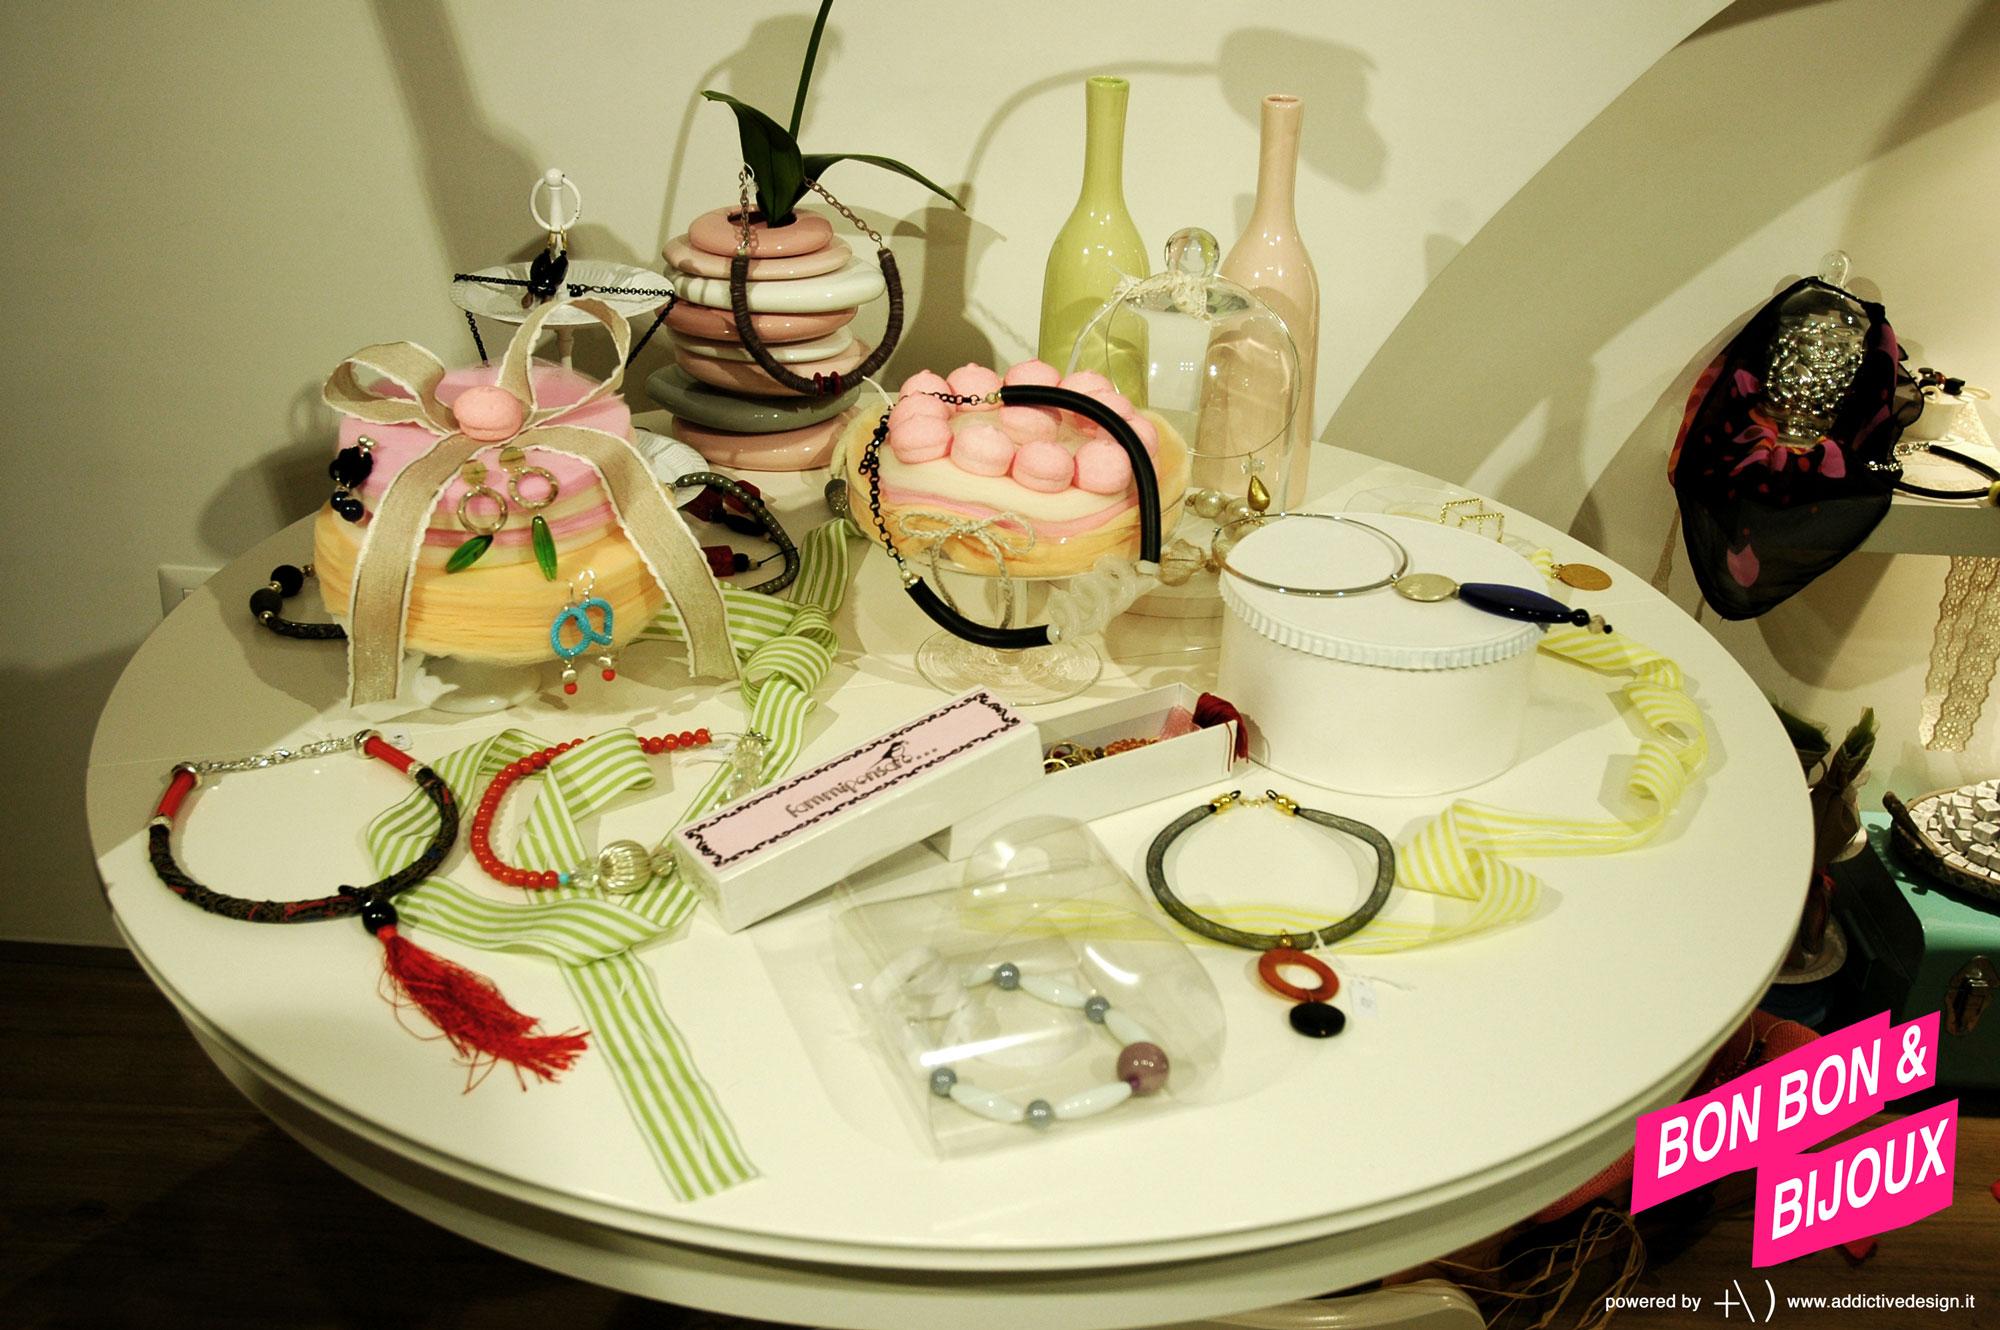 bonbon & bijoux esposizione